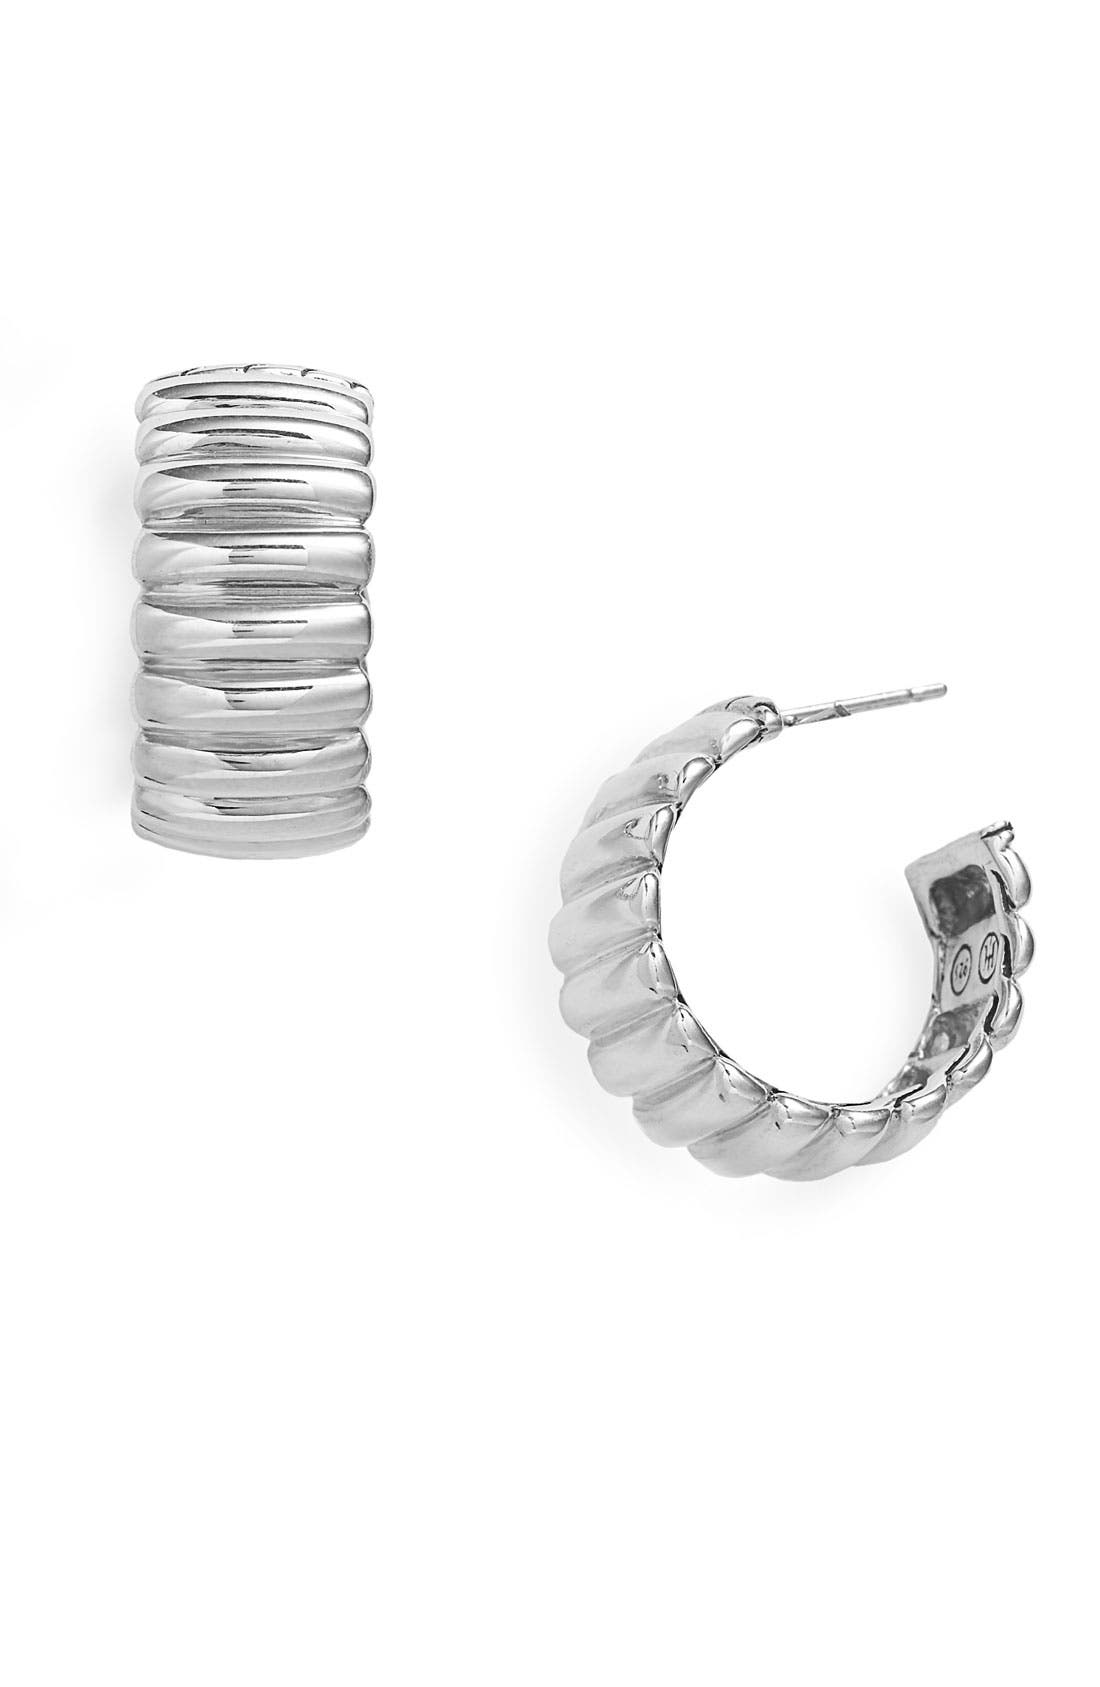 Alternate Image 1 Selected - John Hardy 'Bedeg' Small Hoop Earrings